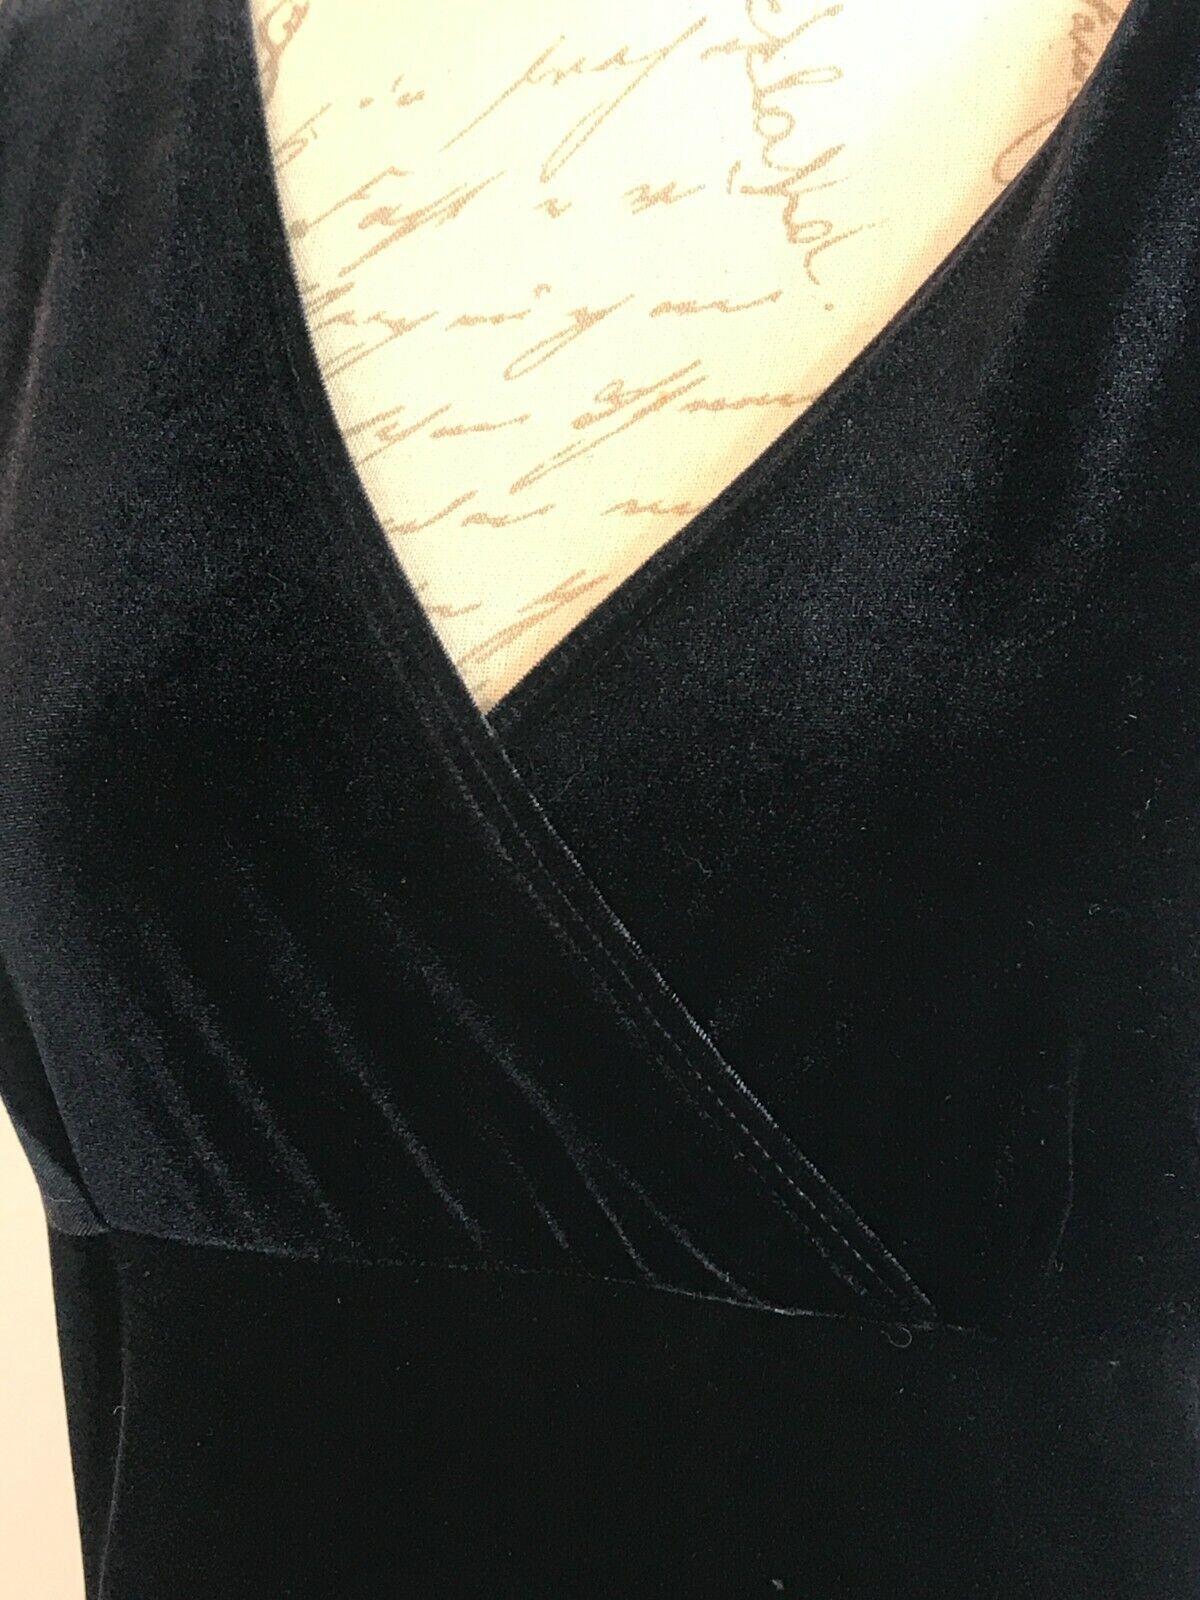 1990s VINTAGE SLINKY BLACK STRETCH VELVET MAXI EV… - image 6